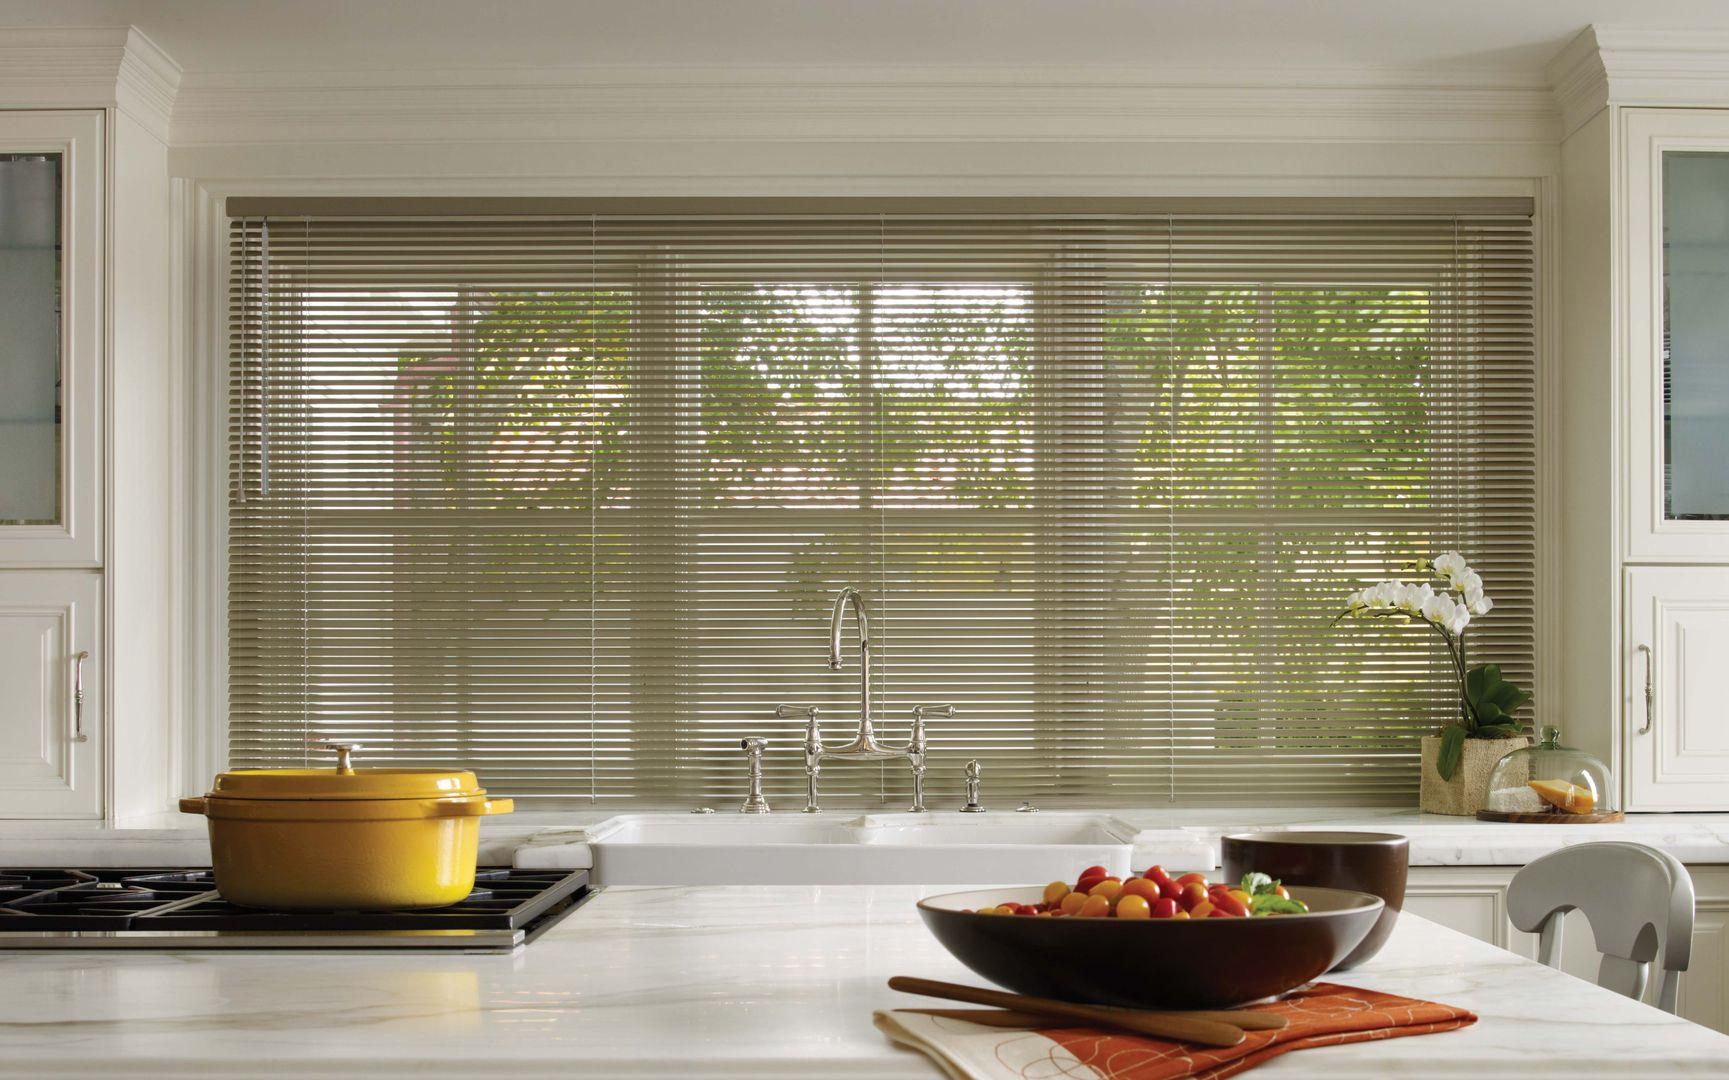 colorado project alta custom shutters blinds shade solar shades fashions min screen dual window